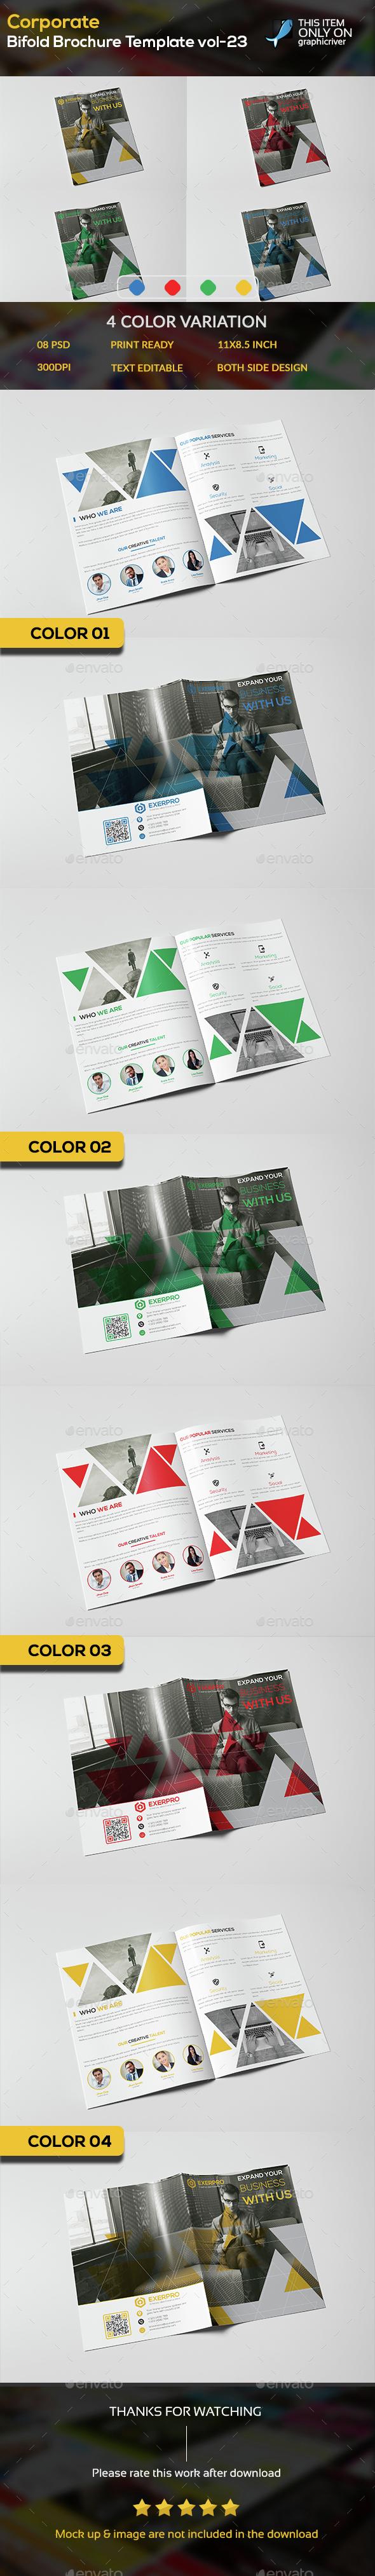 Corporate Bifold Brochure template vol-23 - Brochures Print Templates